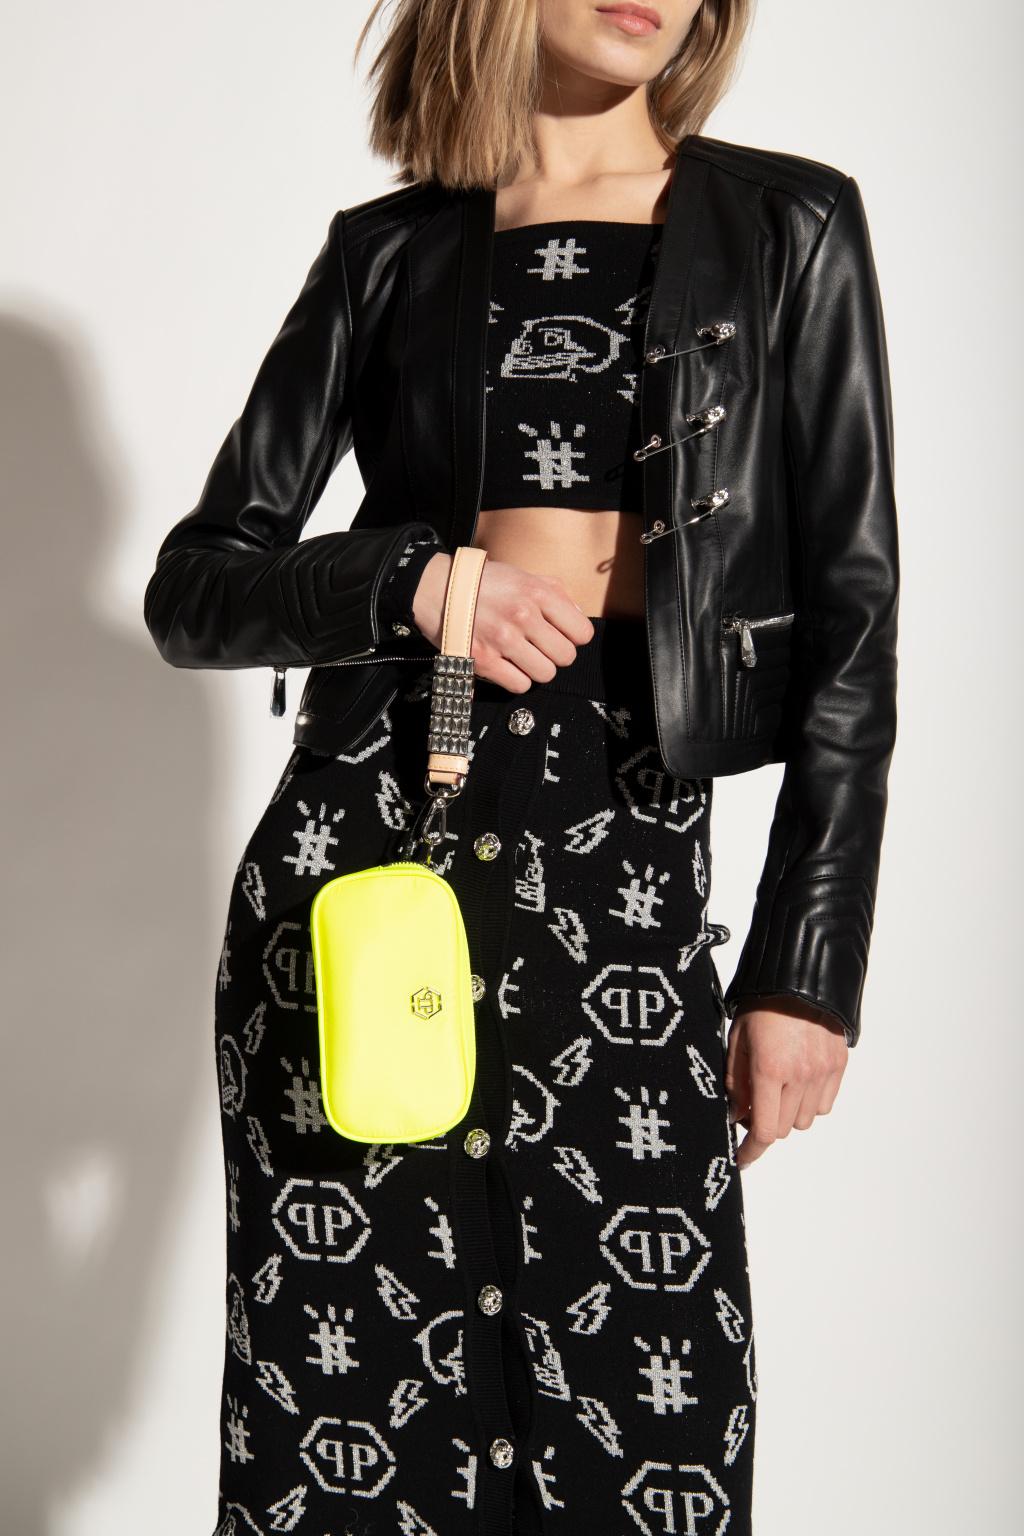 Philipp Plein Hand bag with logo